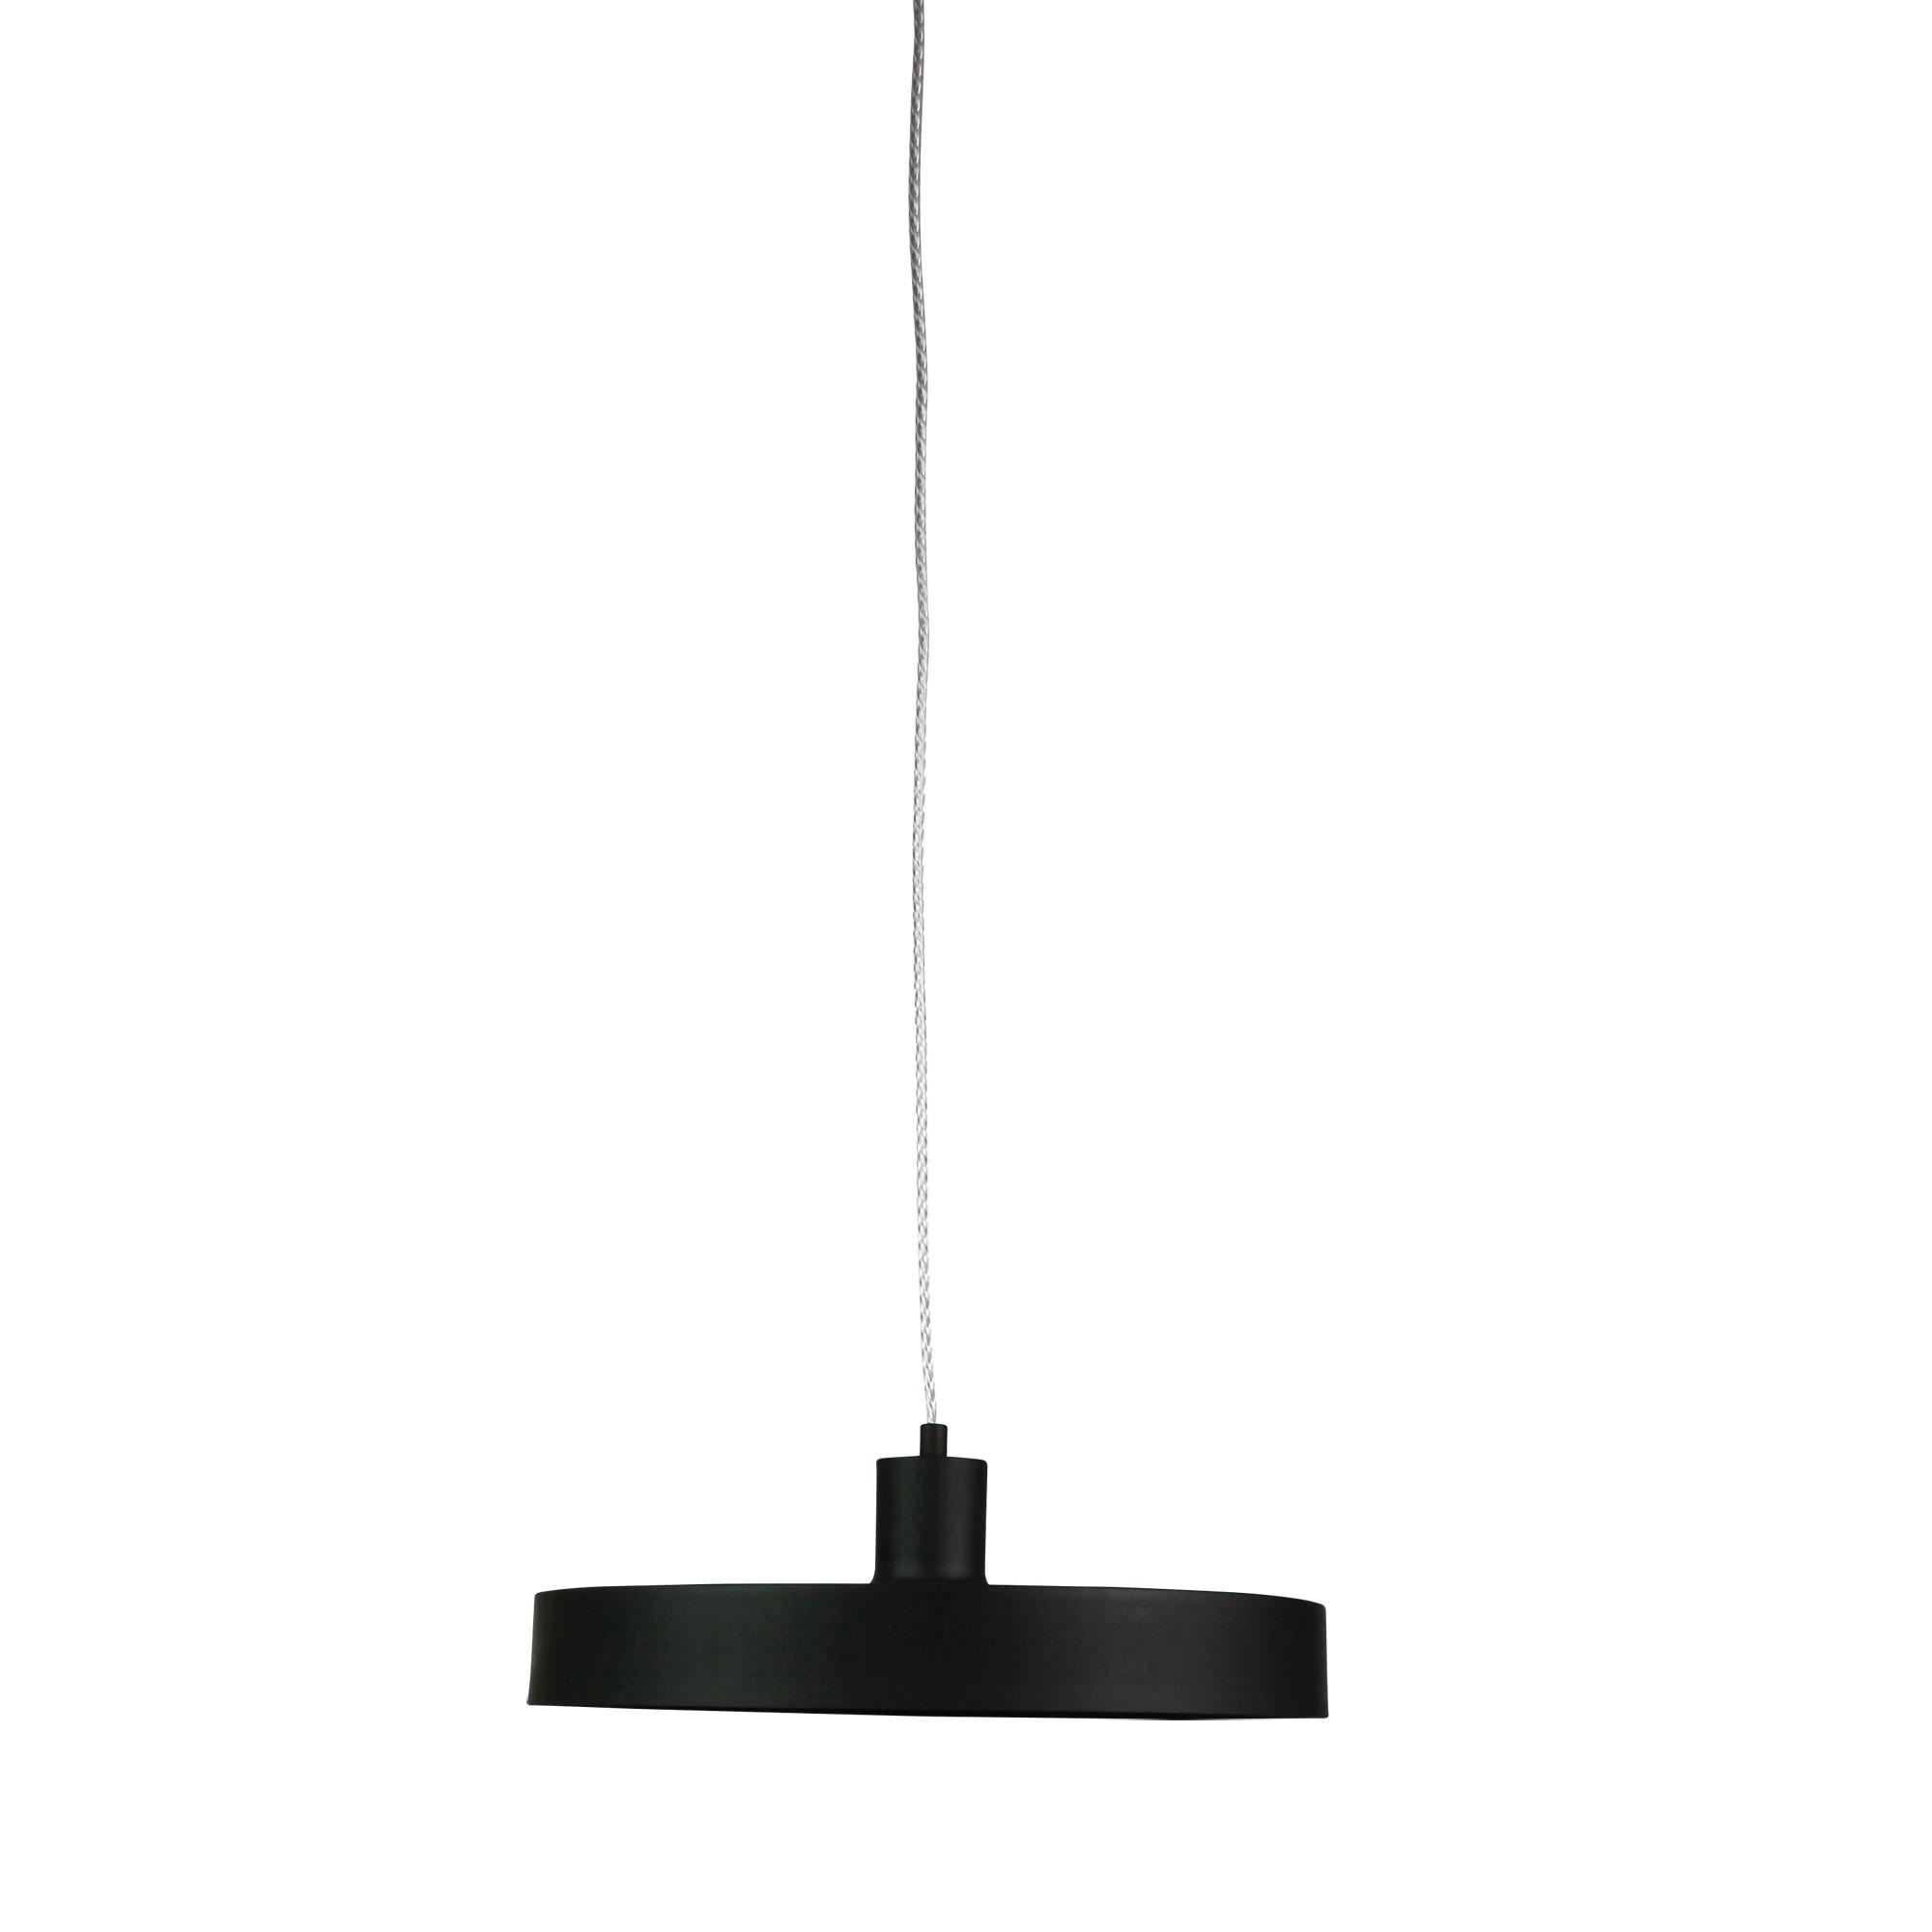 Orbis Metal Pendant Light, Black